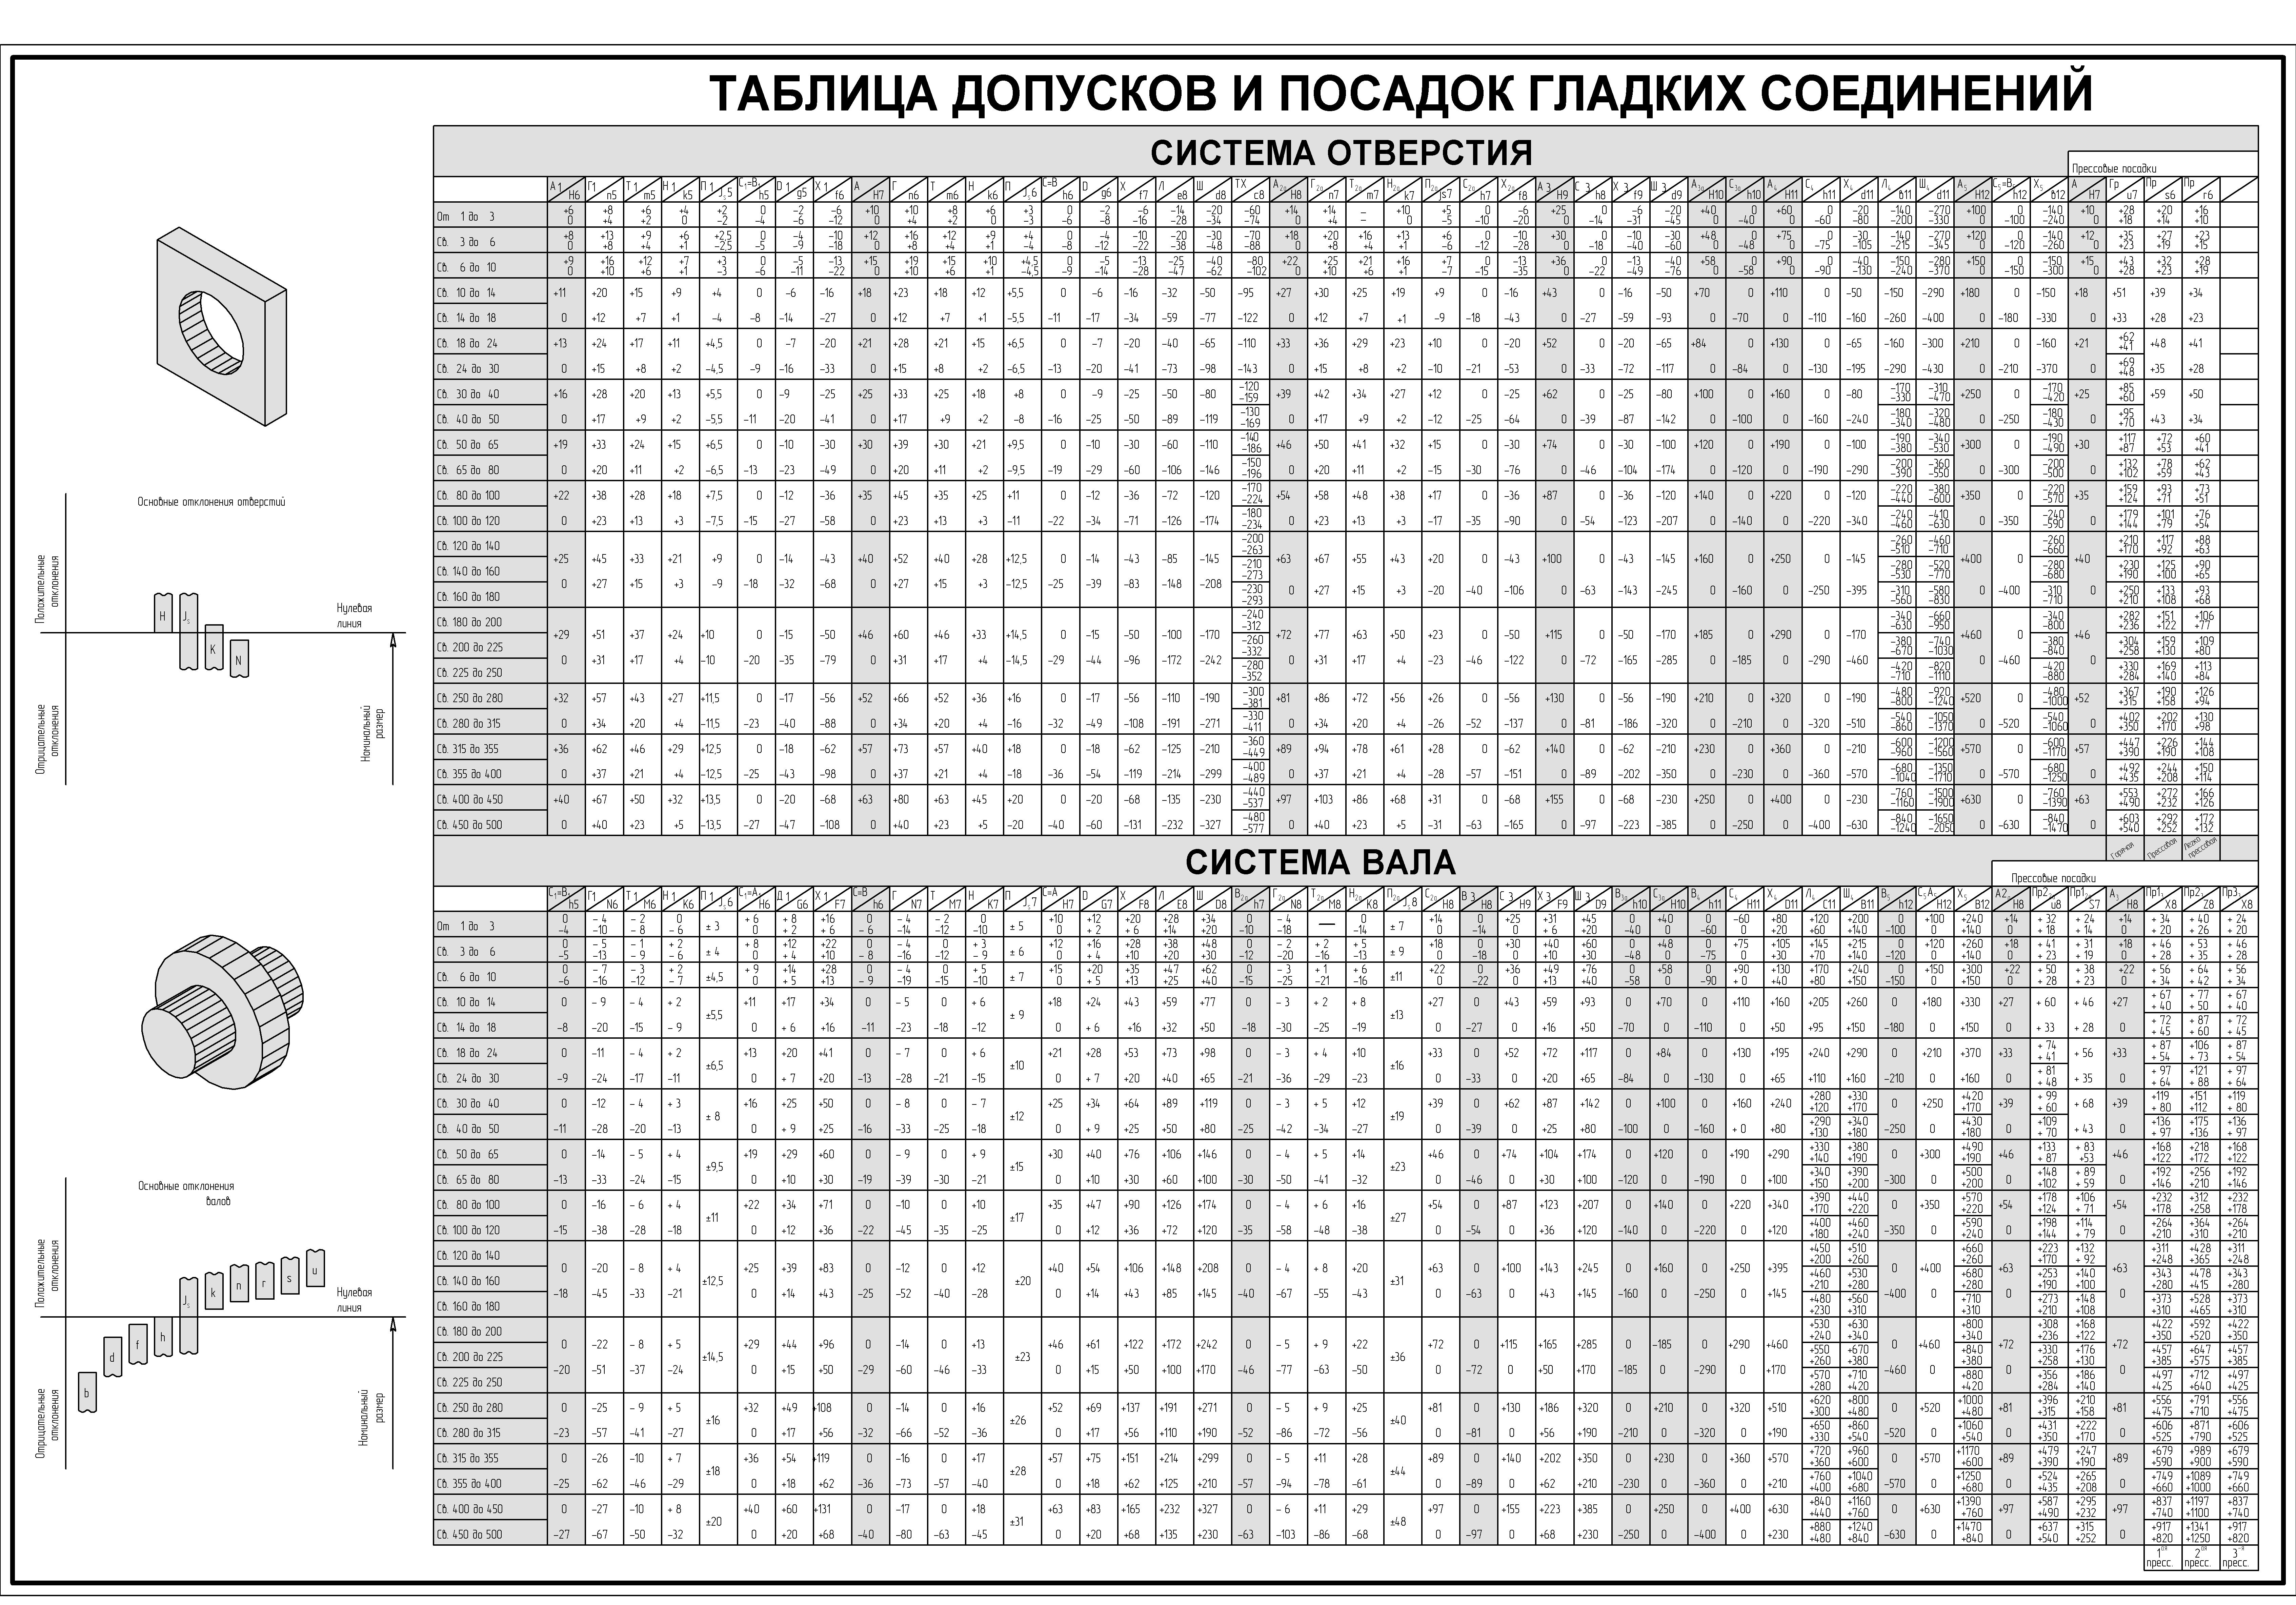 Схема допусков и посадок